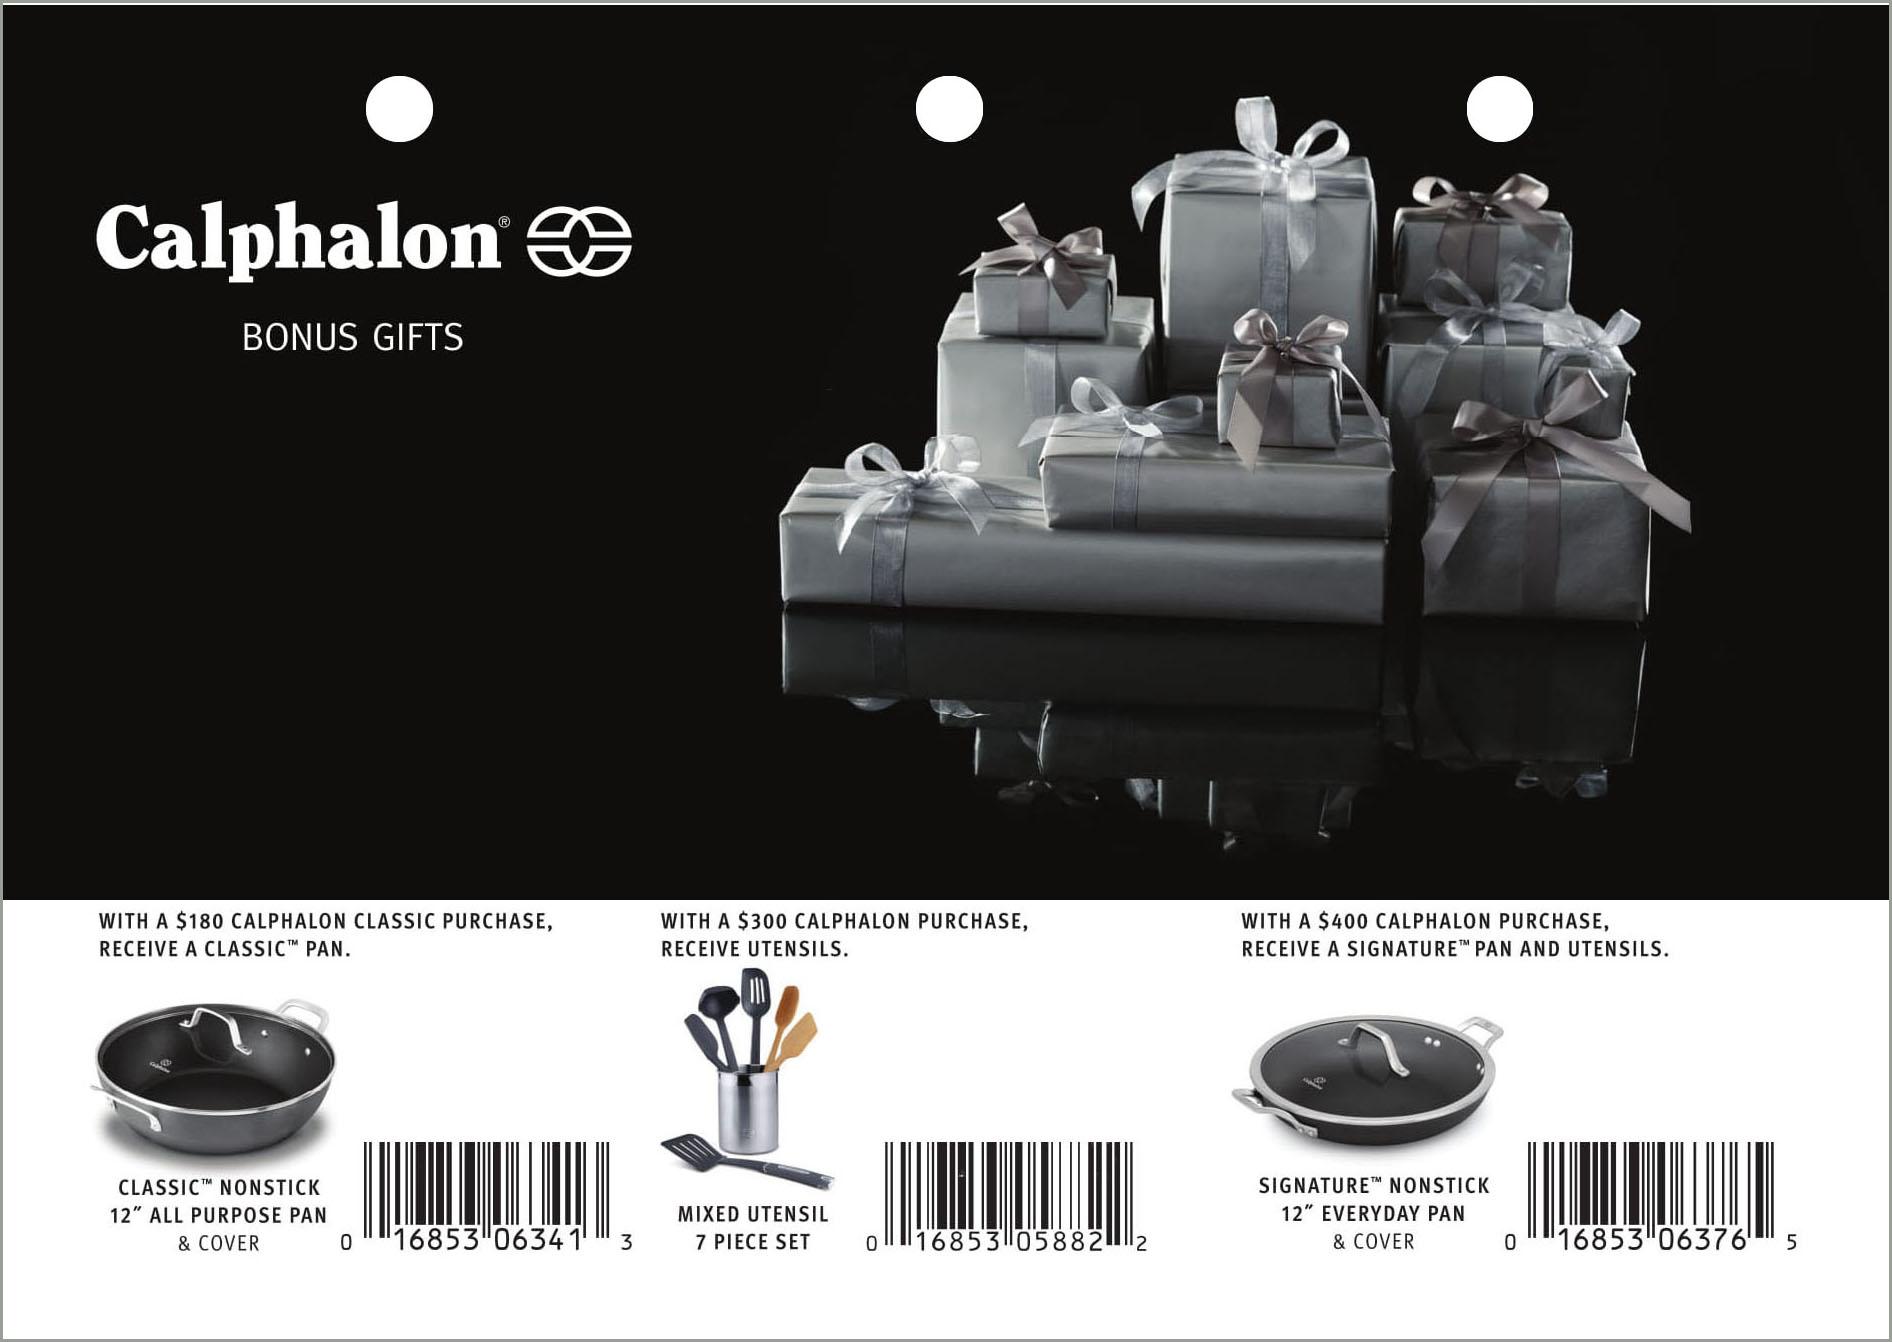 Calphalon_Flipbook_Pages_0000s_0016_75783_Calphalon_Macys_FlipBook_R6_M_0000_75783_Calphalon_Macys_FlipBook_R6_M_PDFX1A-.jpg